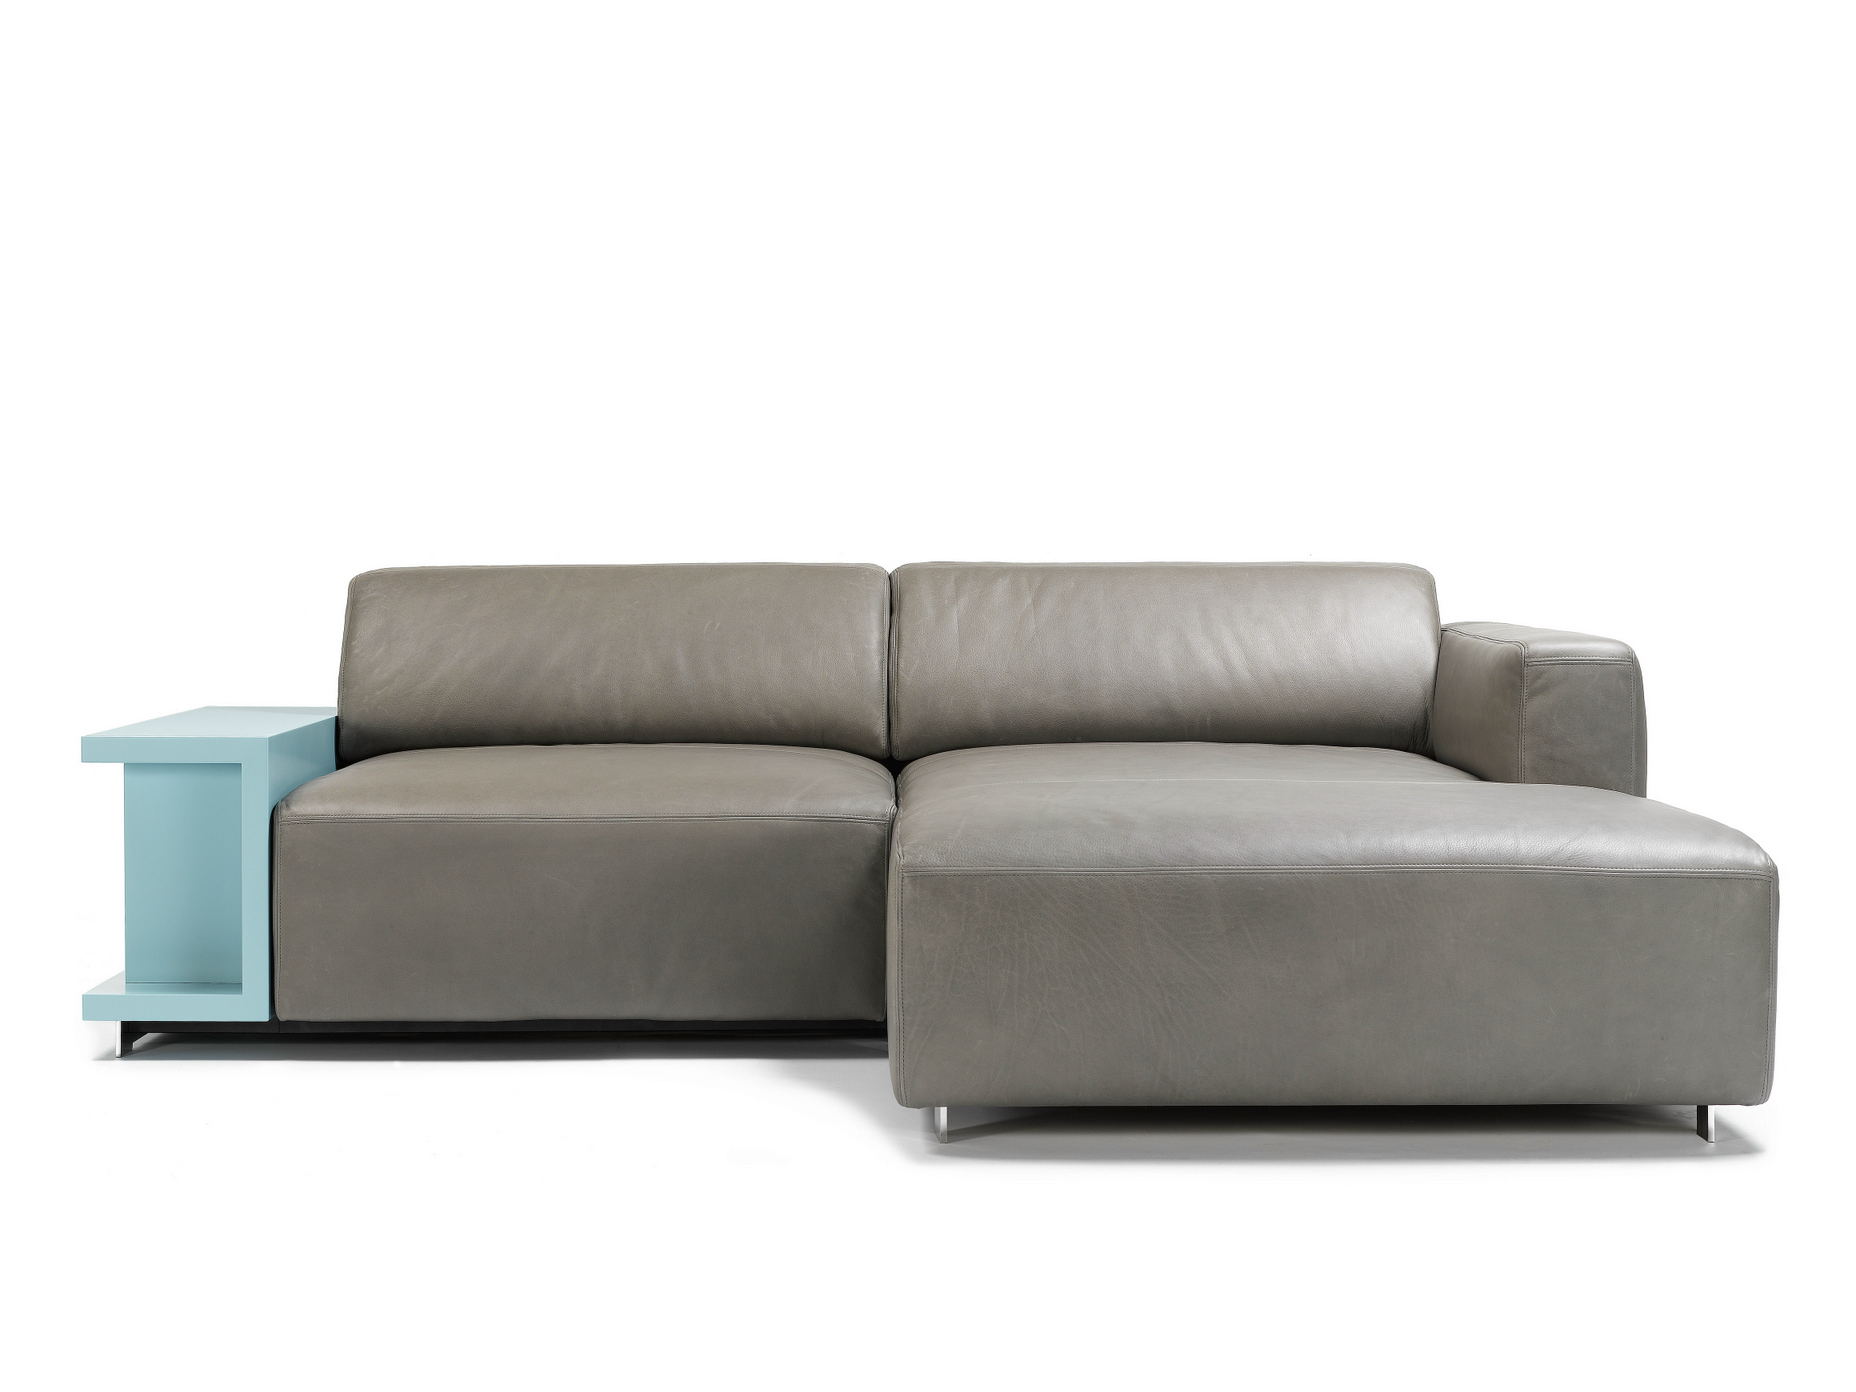 Long island chaise sofa sofa menzilperde net for Chaise long sofa